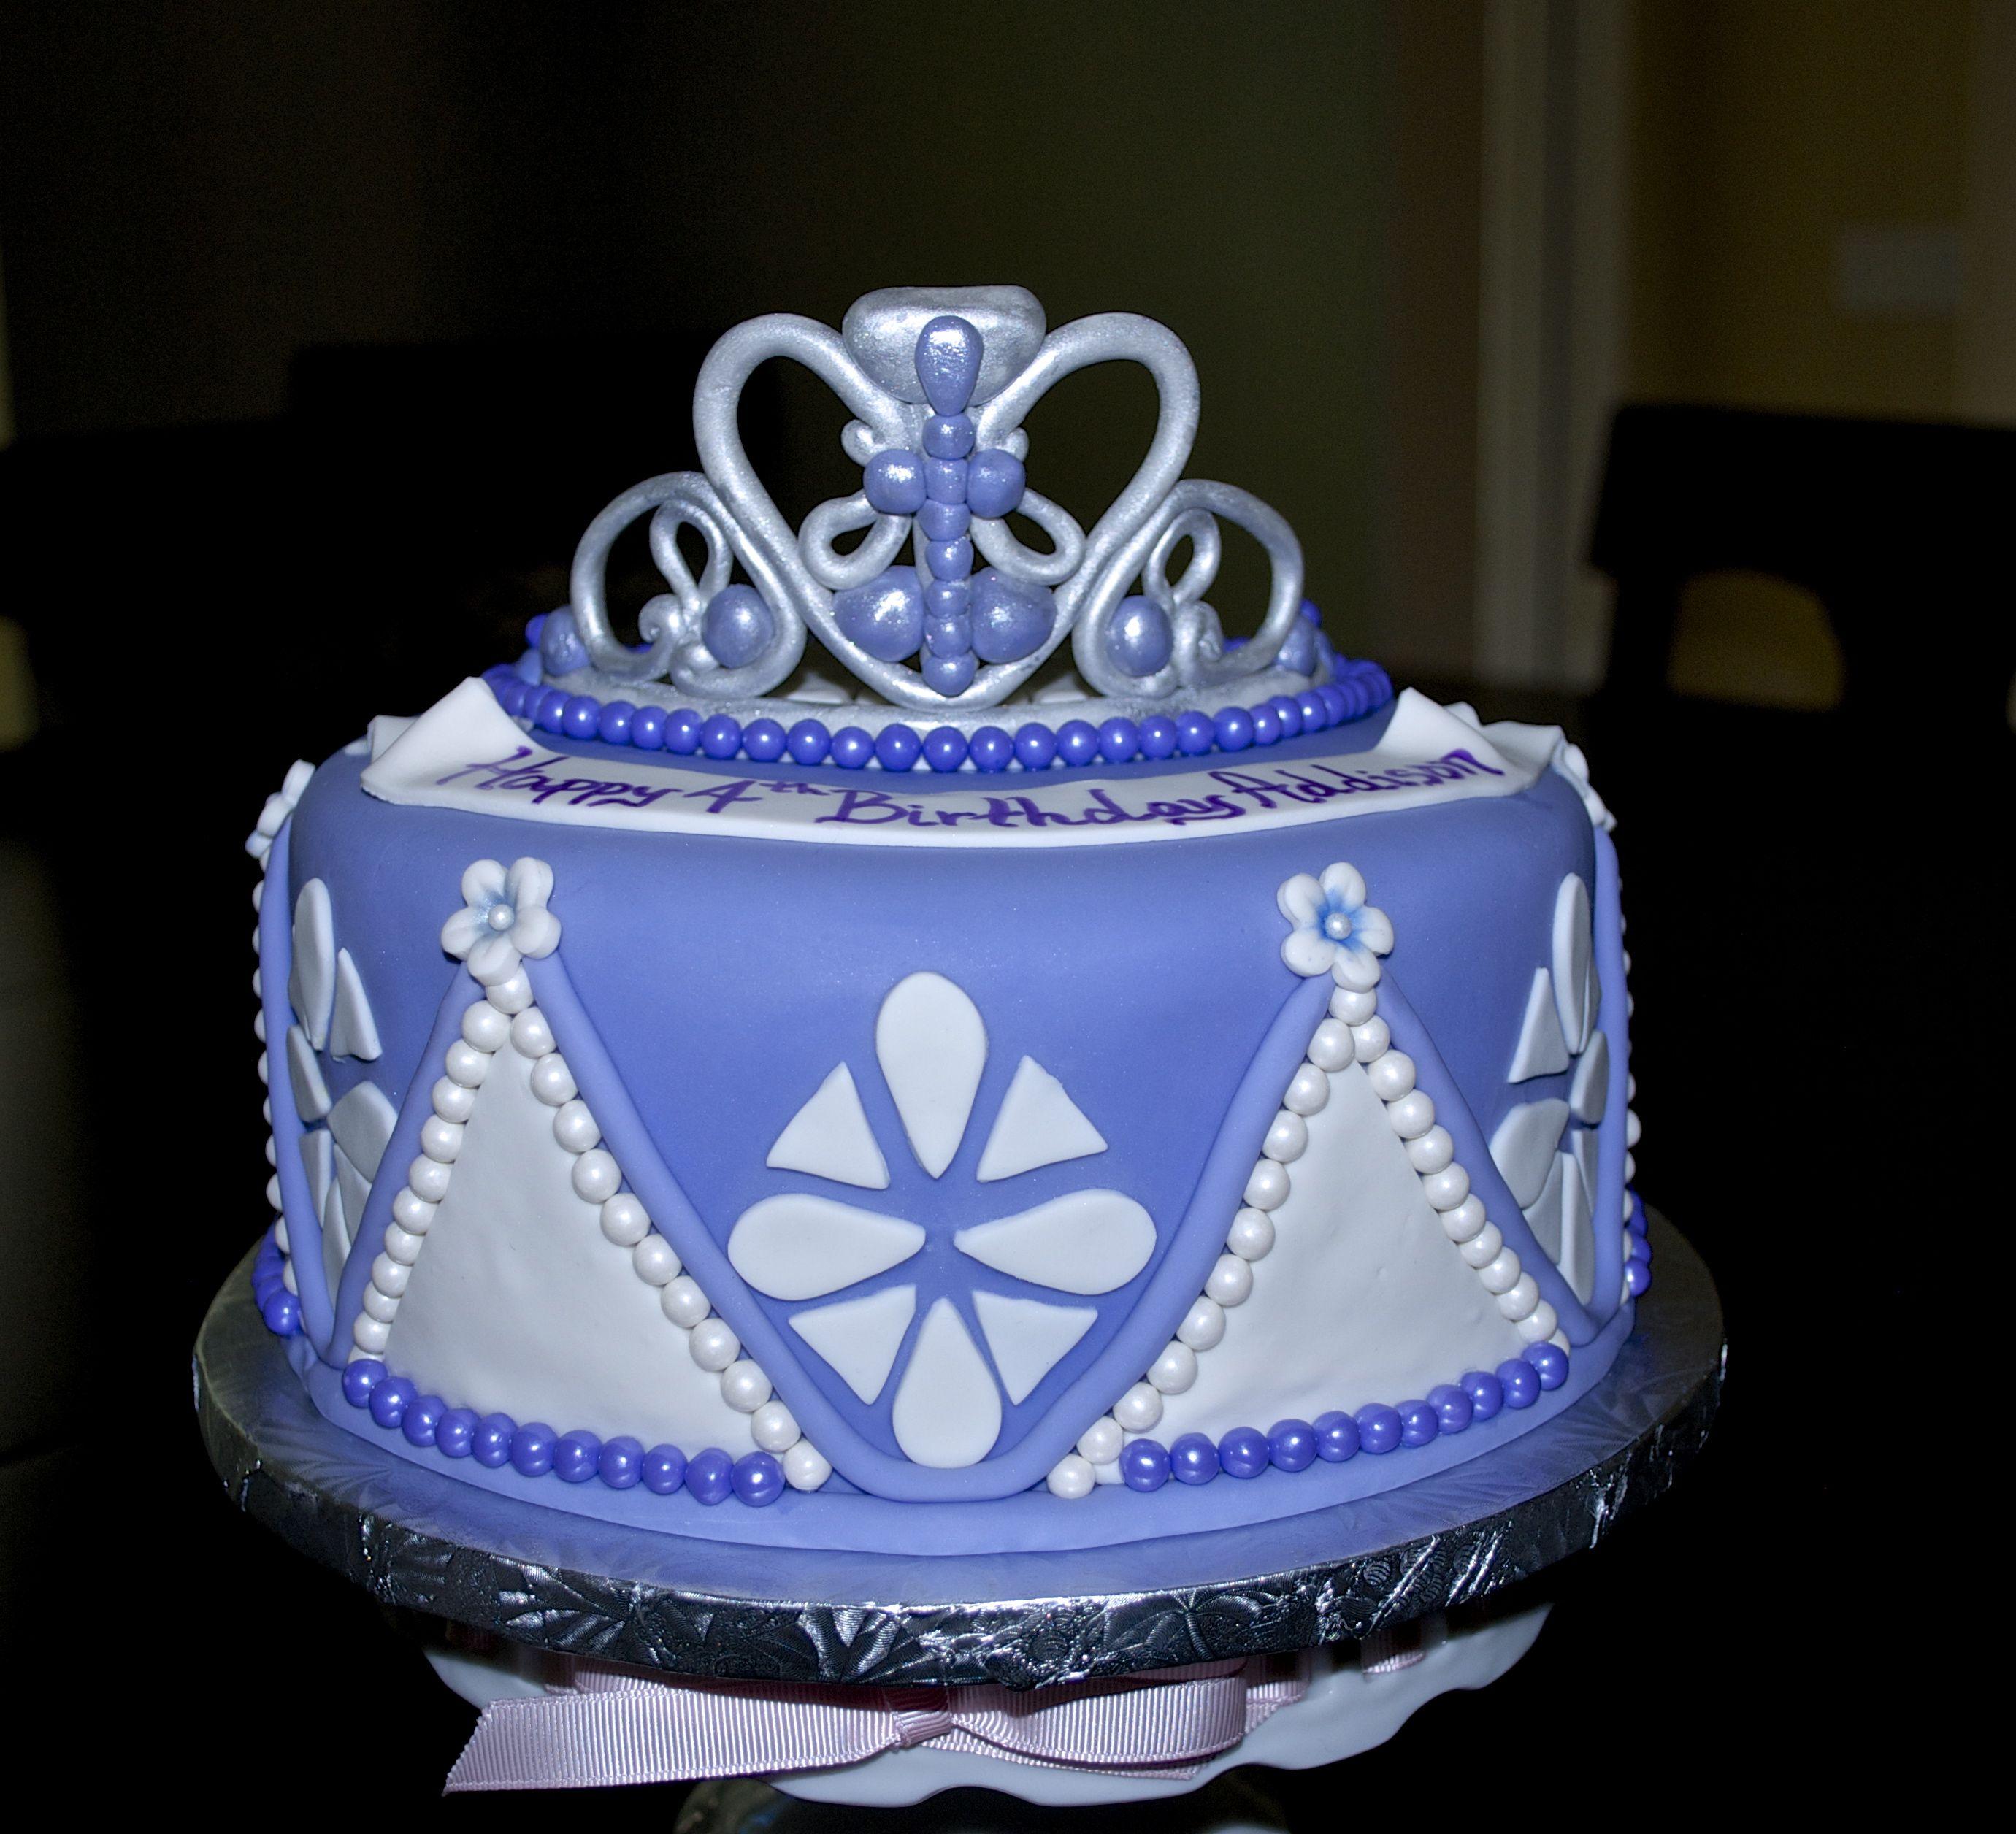 Princess sofia inspired cake cake desserts bakery